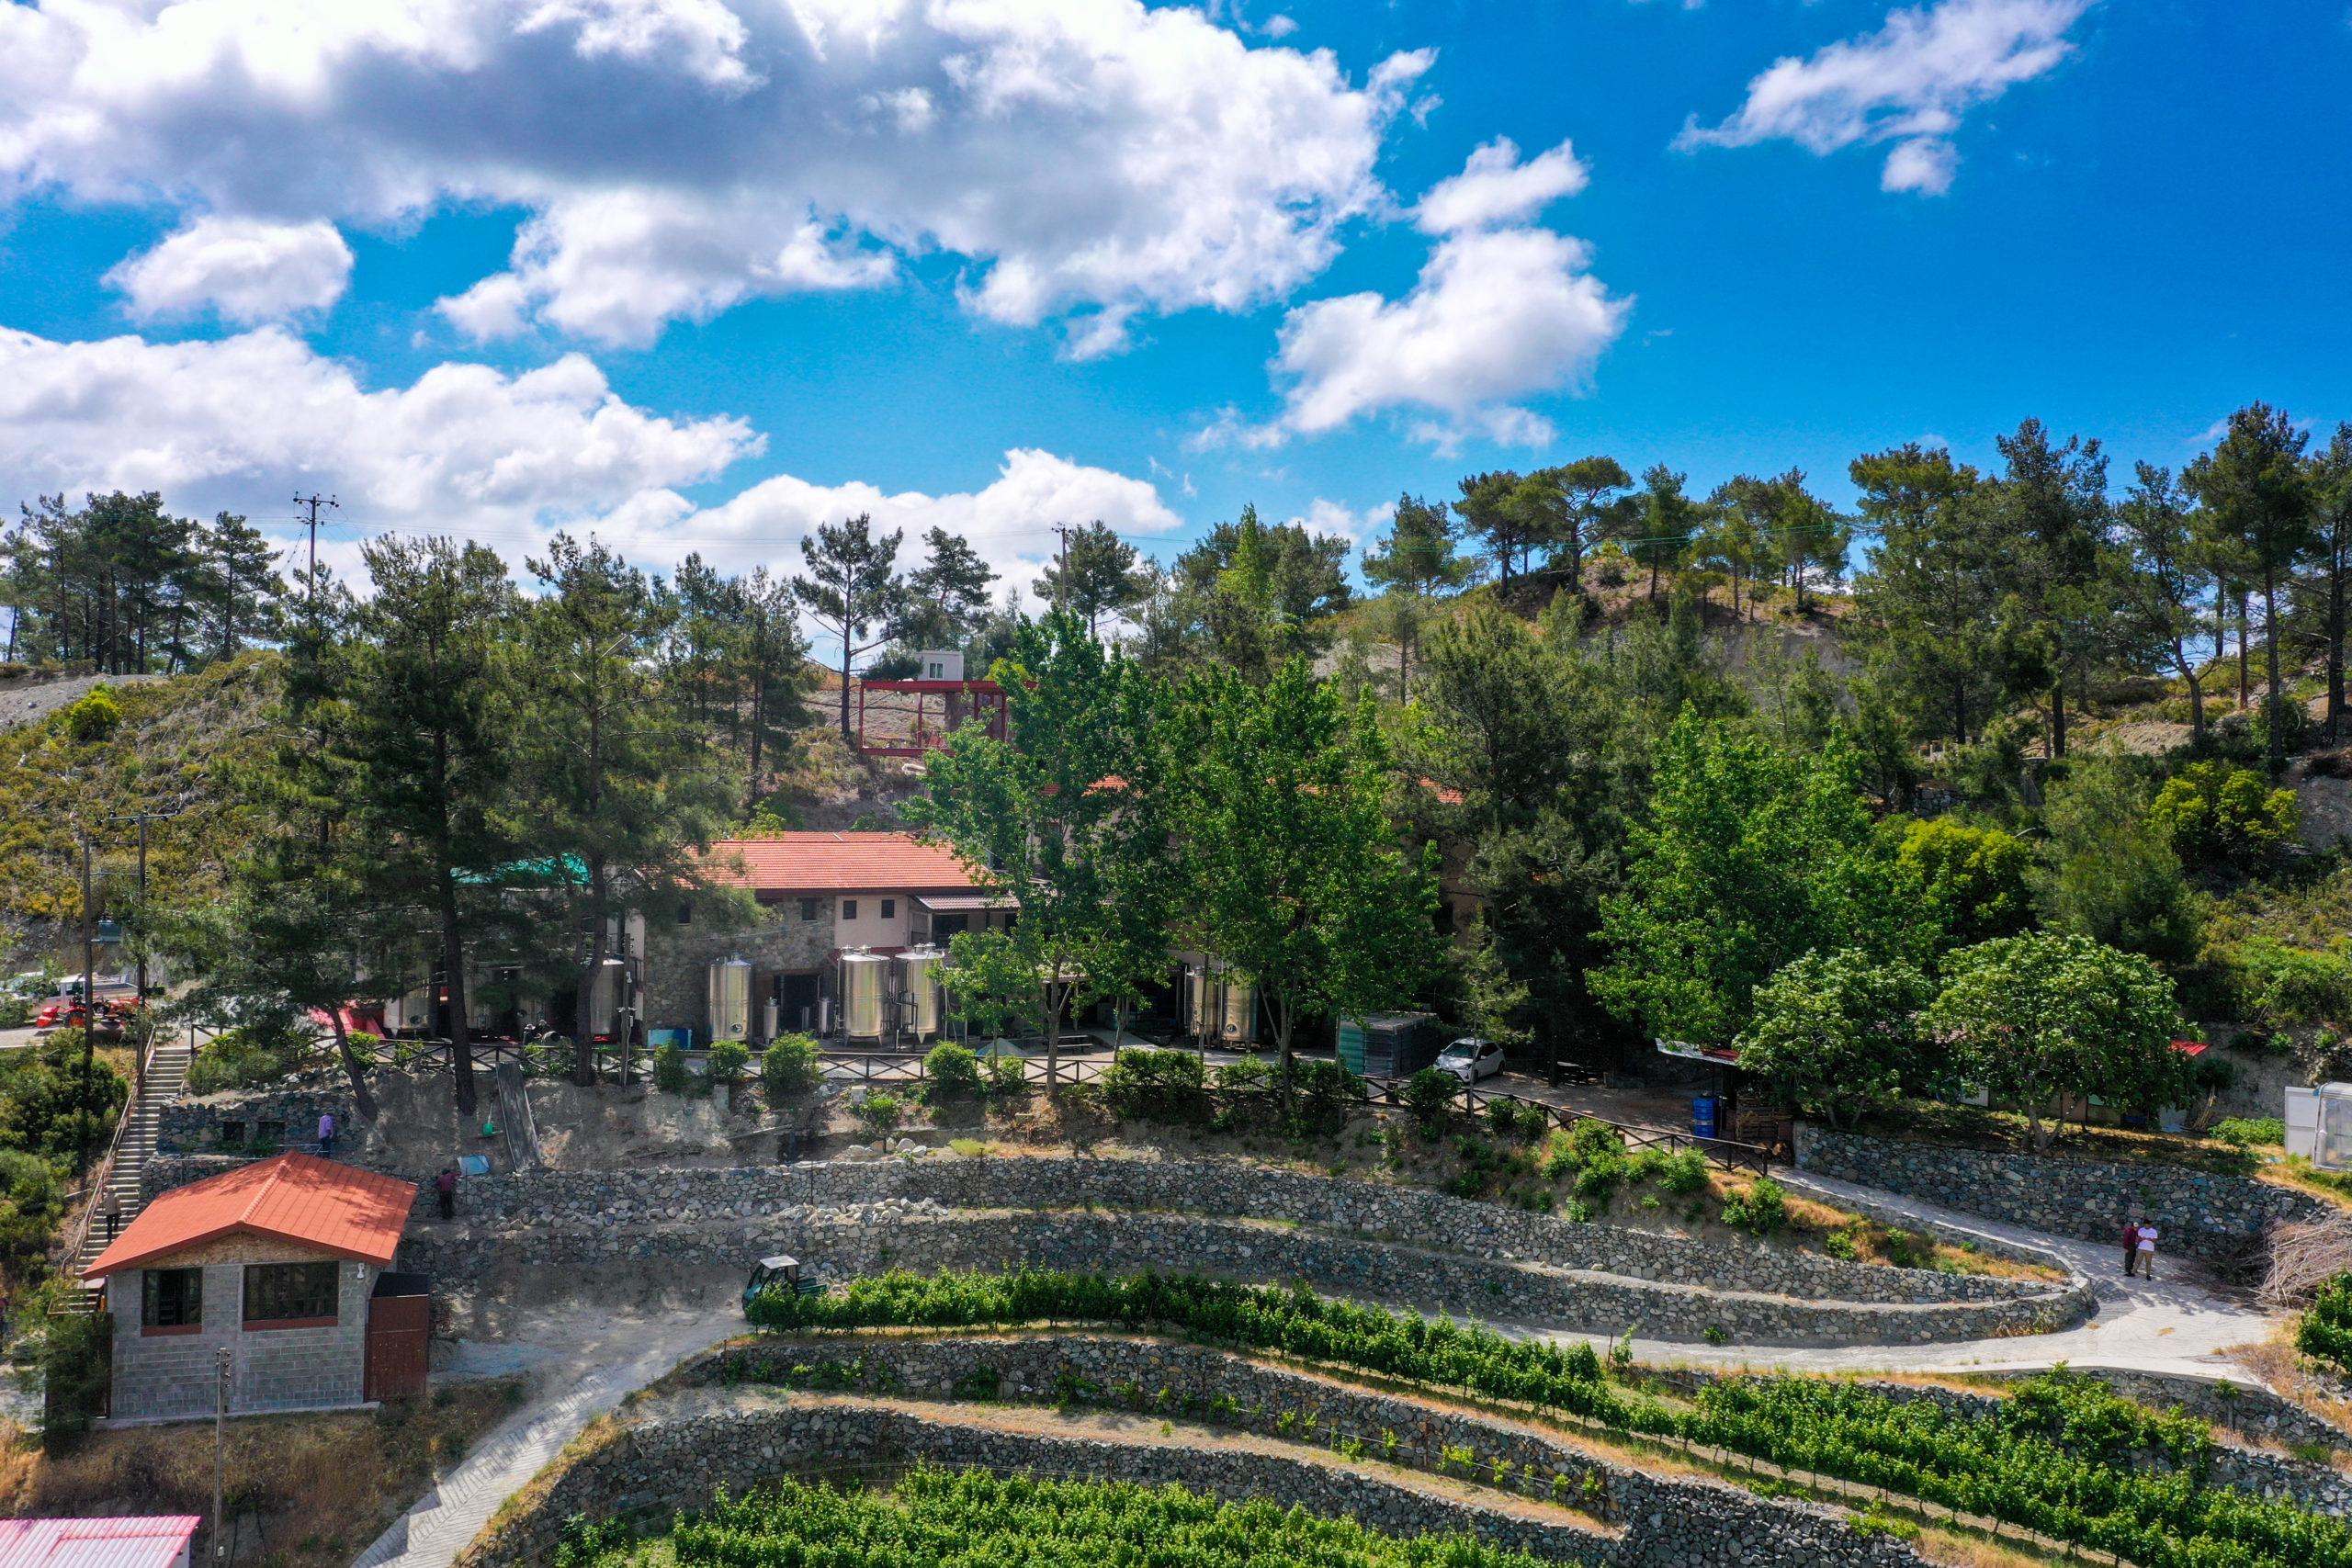 Cyprus wines maturing